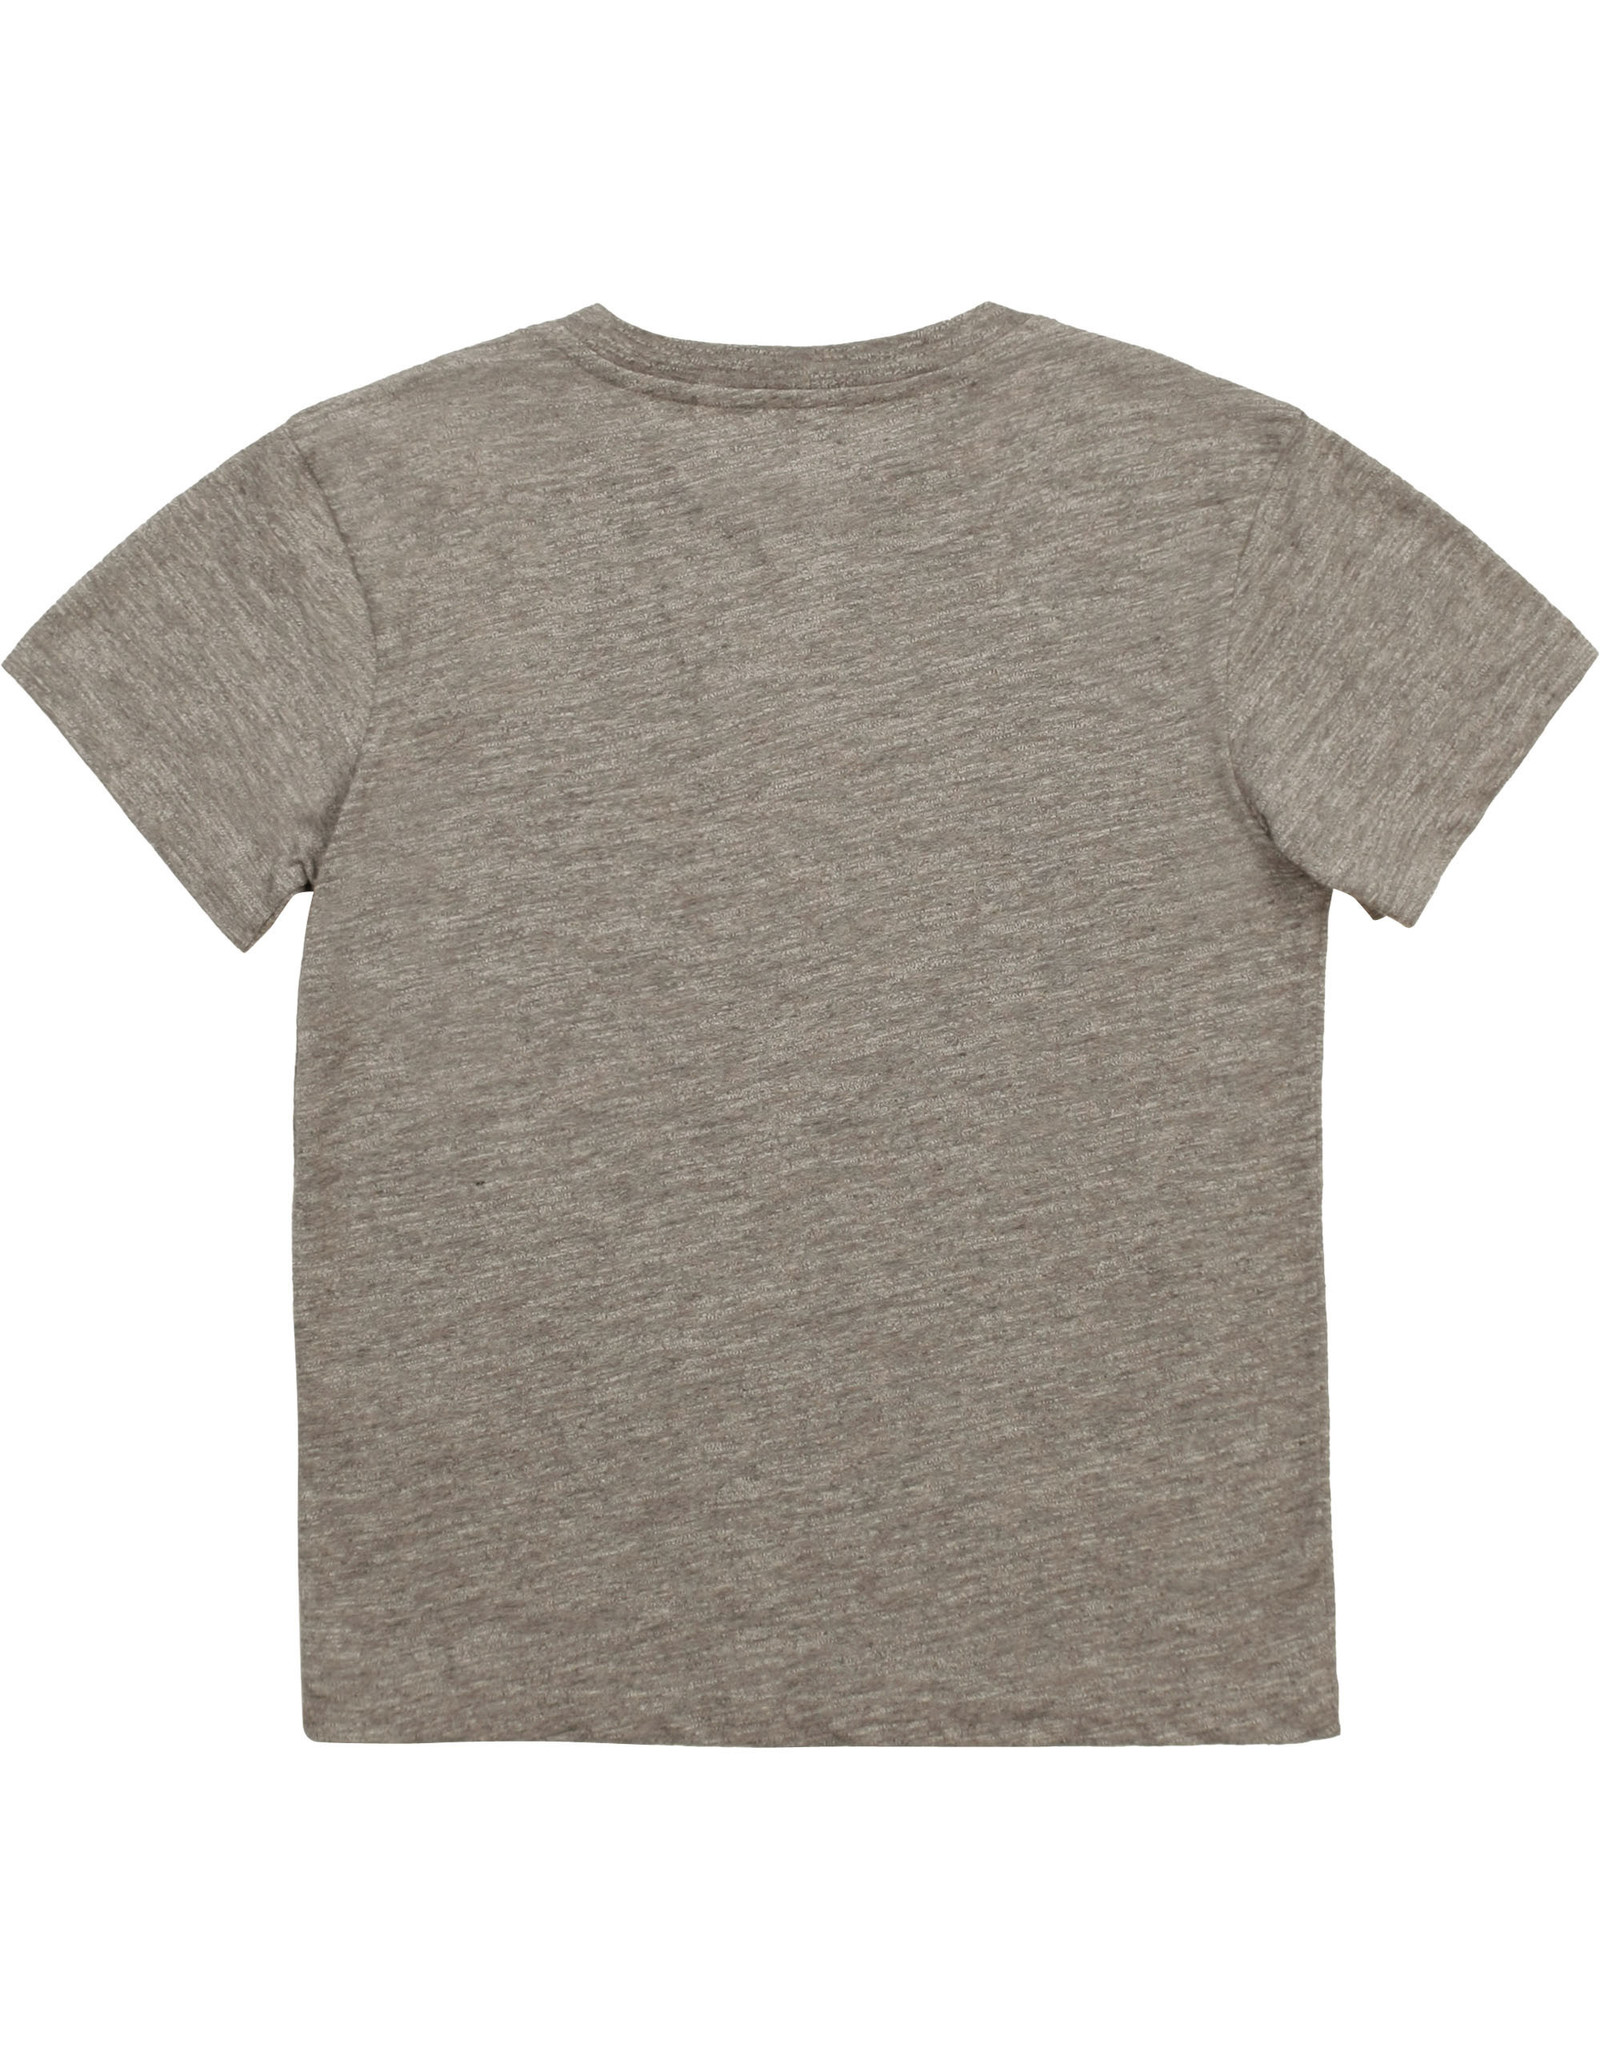 Zadig&Voltaire Z&V X25263 T-shirt grey